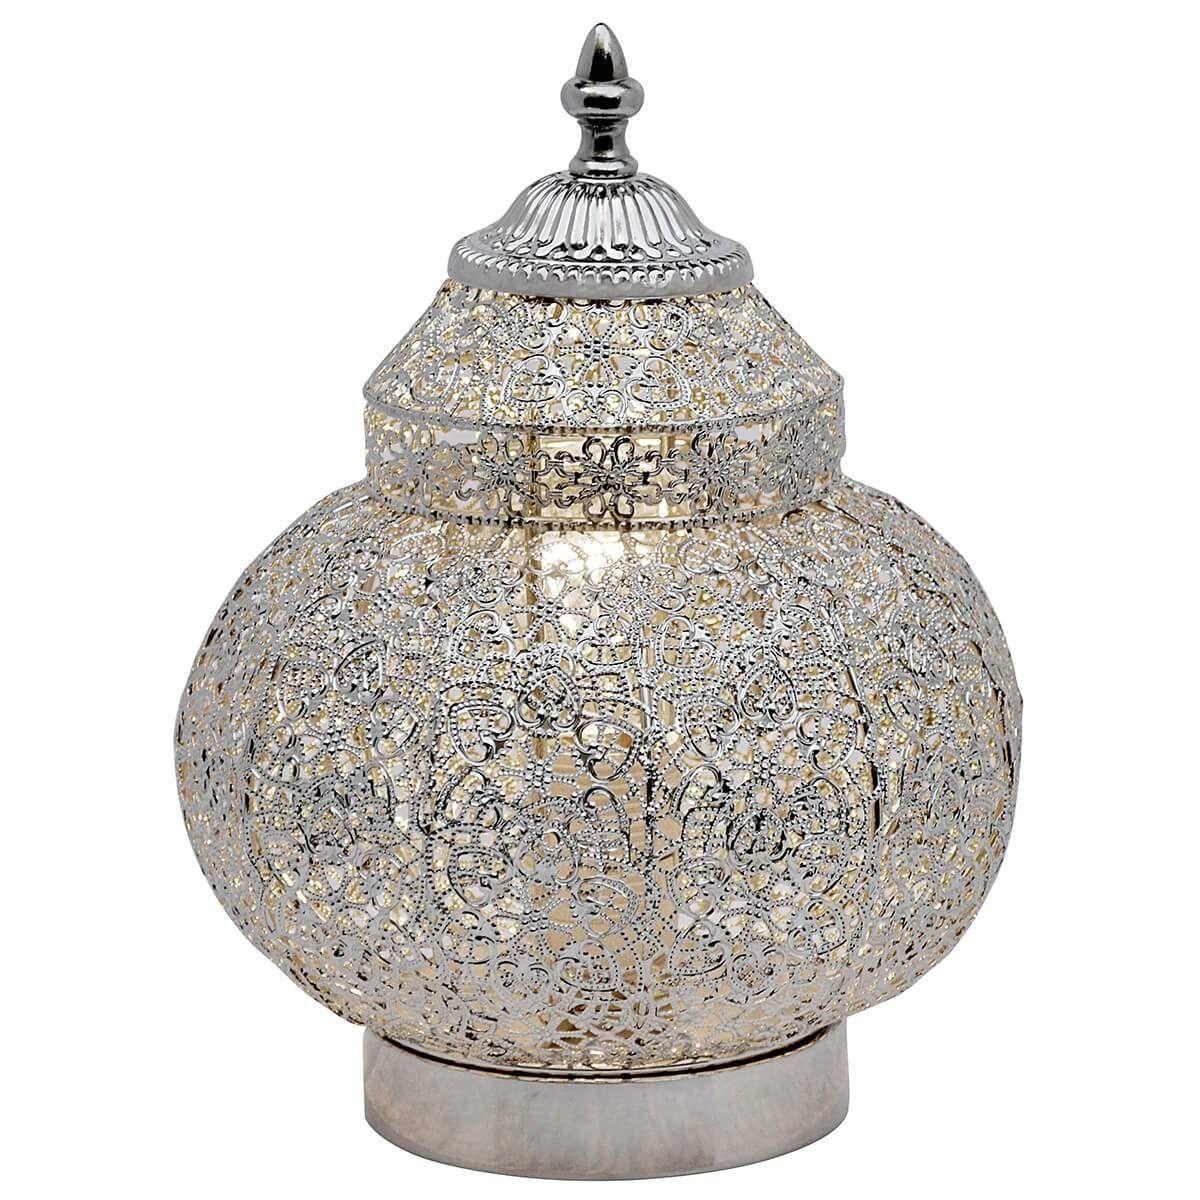 Lampes ŕ Poser Alinea Lampe De Table Ribbon Habitat Lampe De